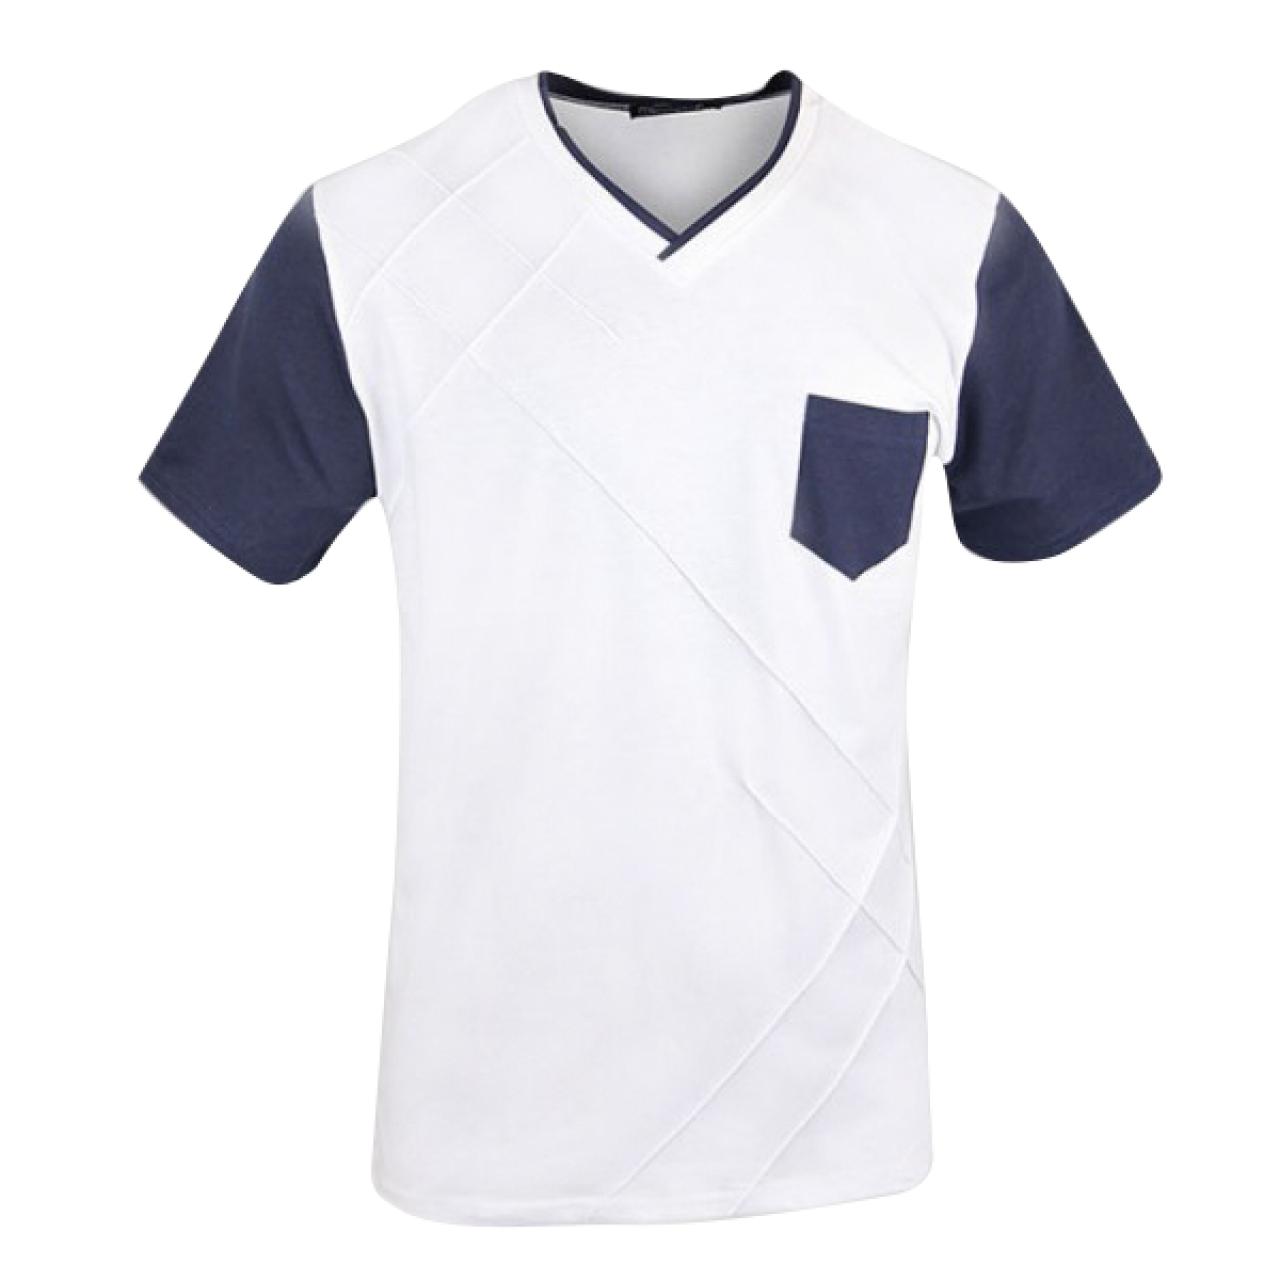 Men's V-Neck Tee Royal White Color With Designer Stripe